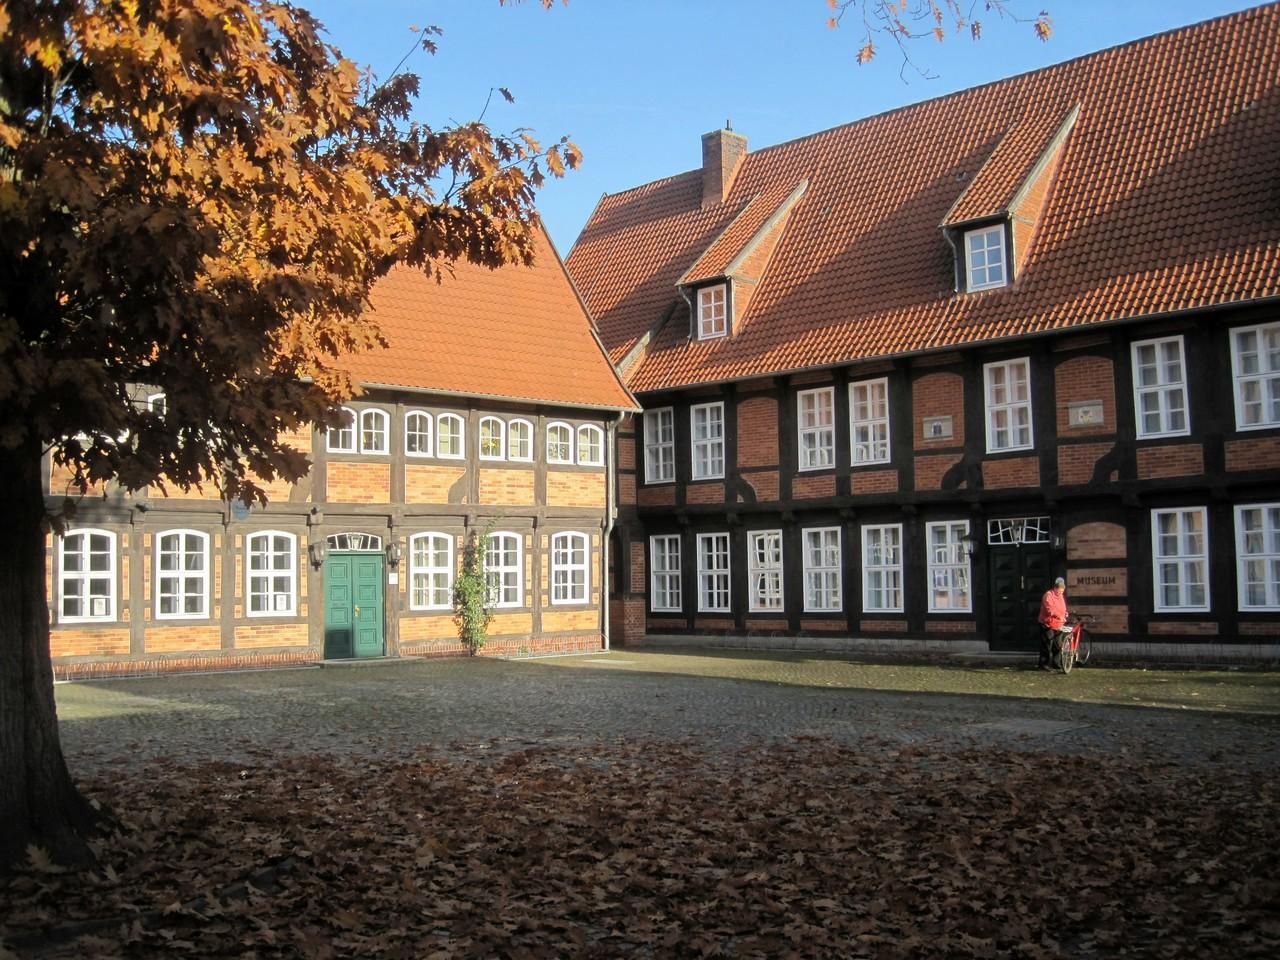 Fresenhof - ein ehemaliger Burgmannshof